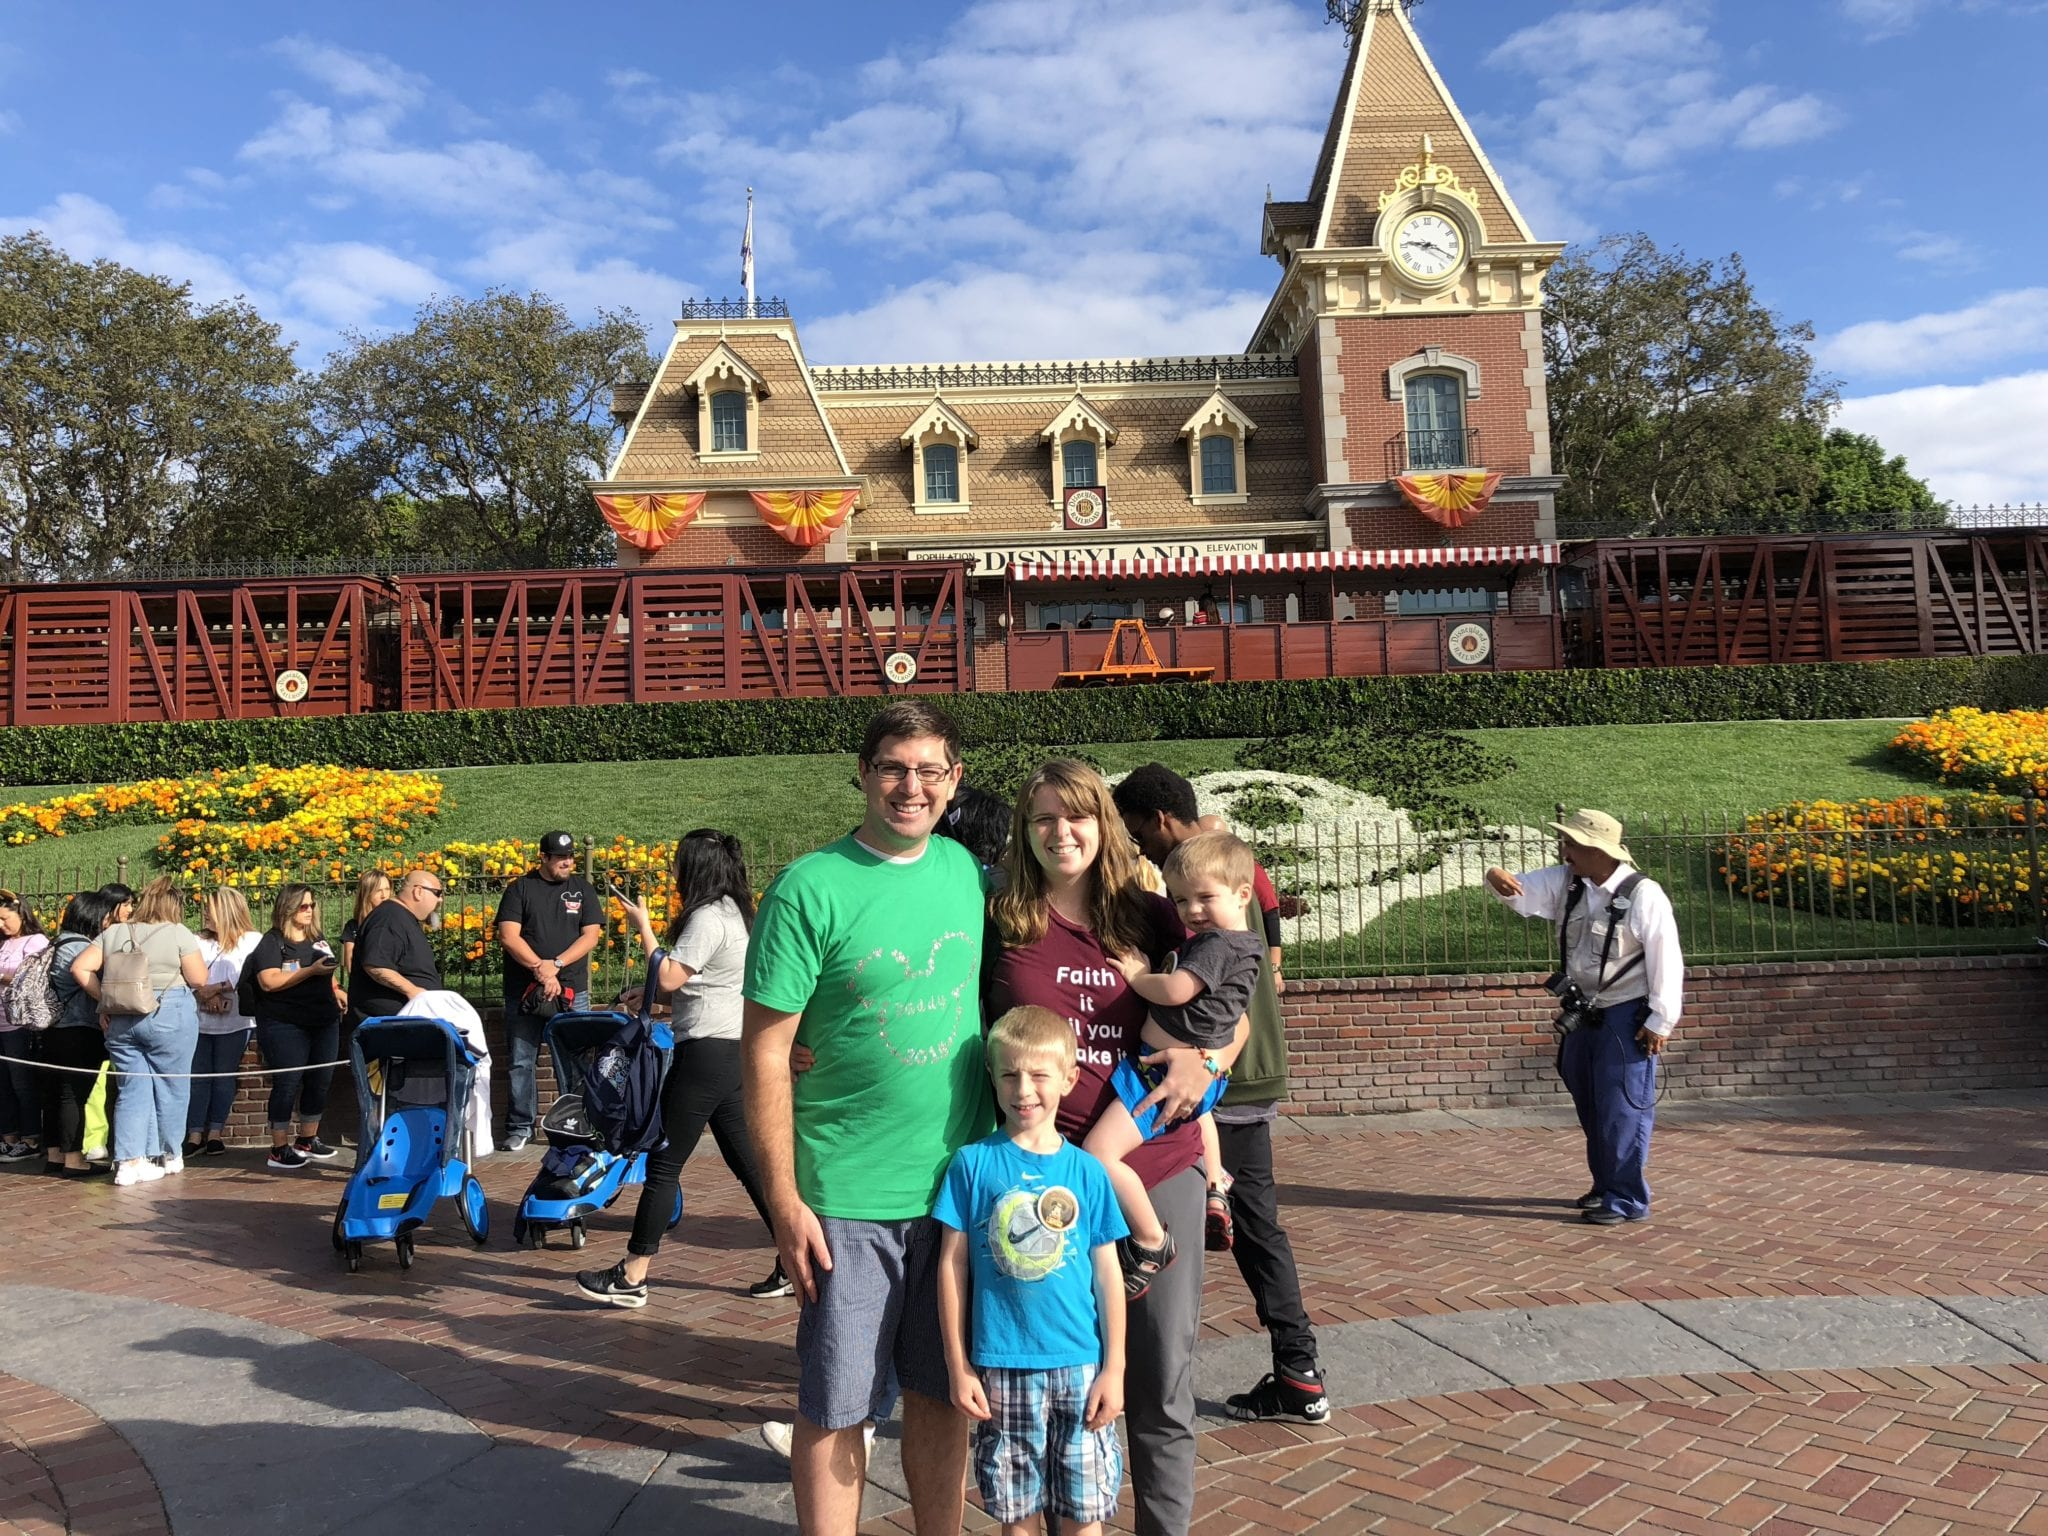 family in front of Disneyland